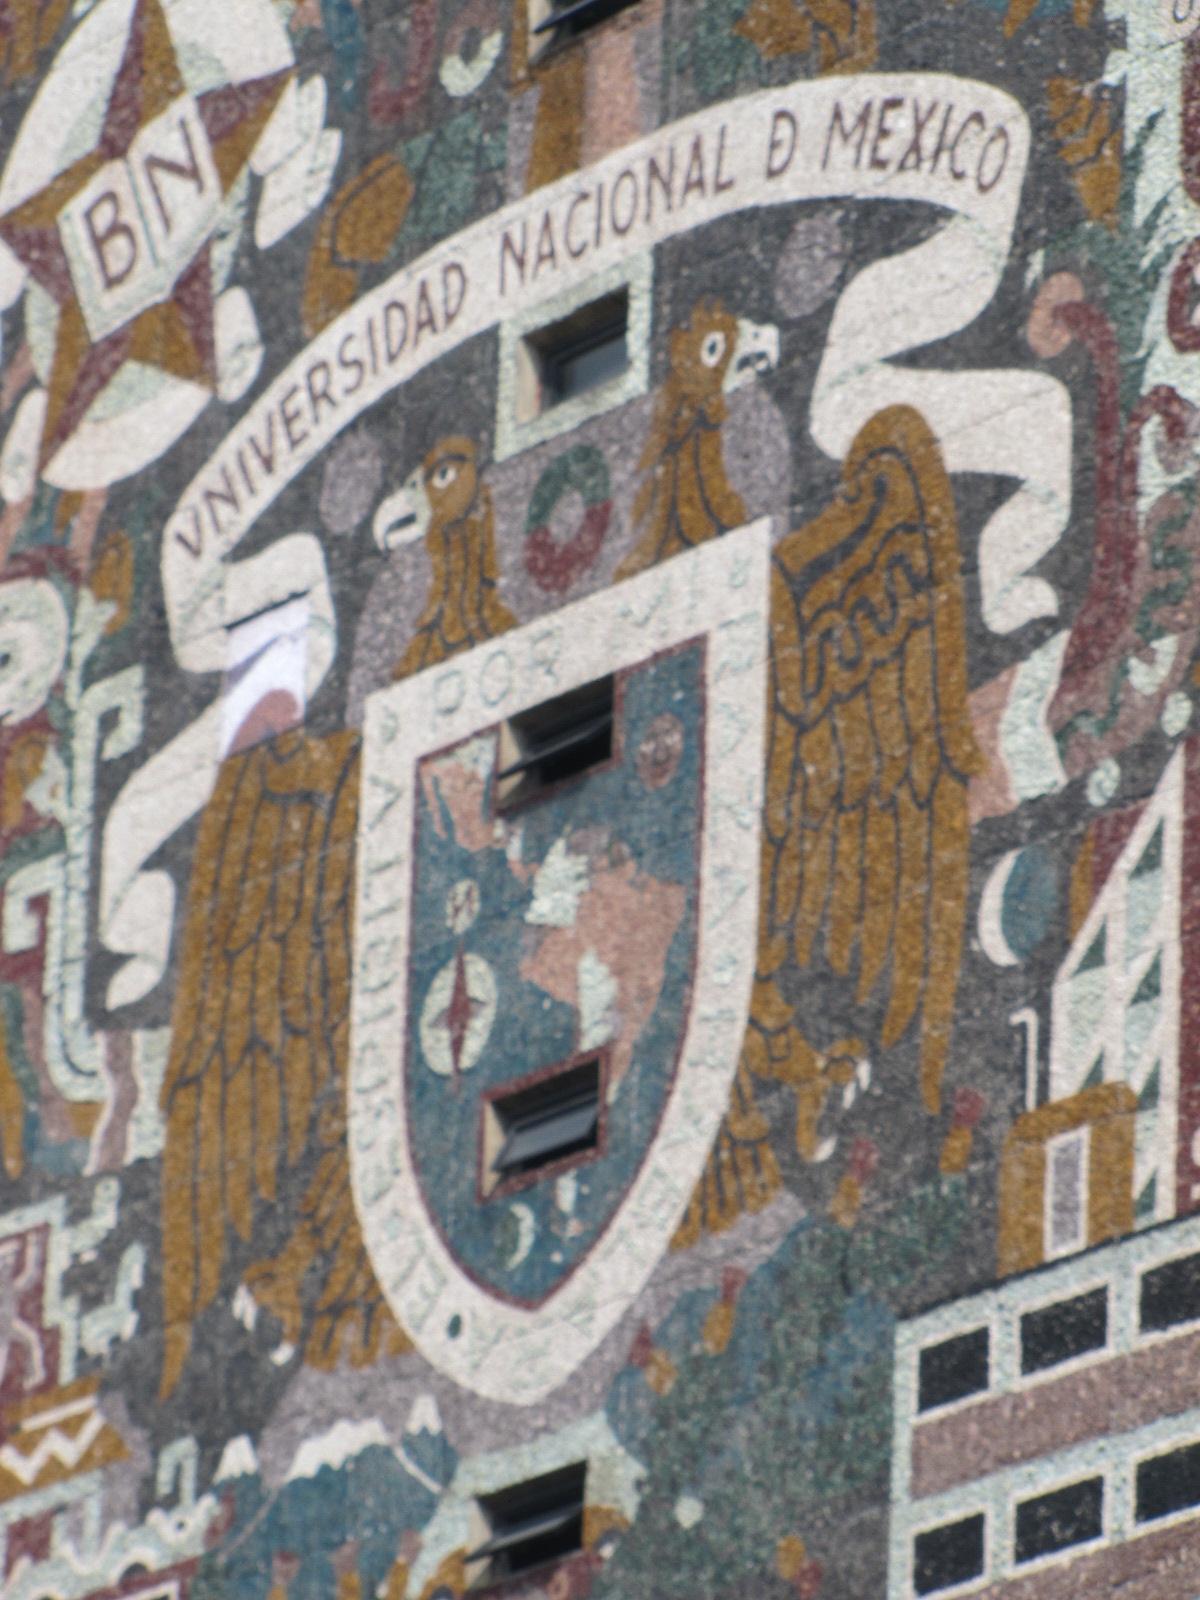 Great UNAM logo